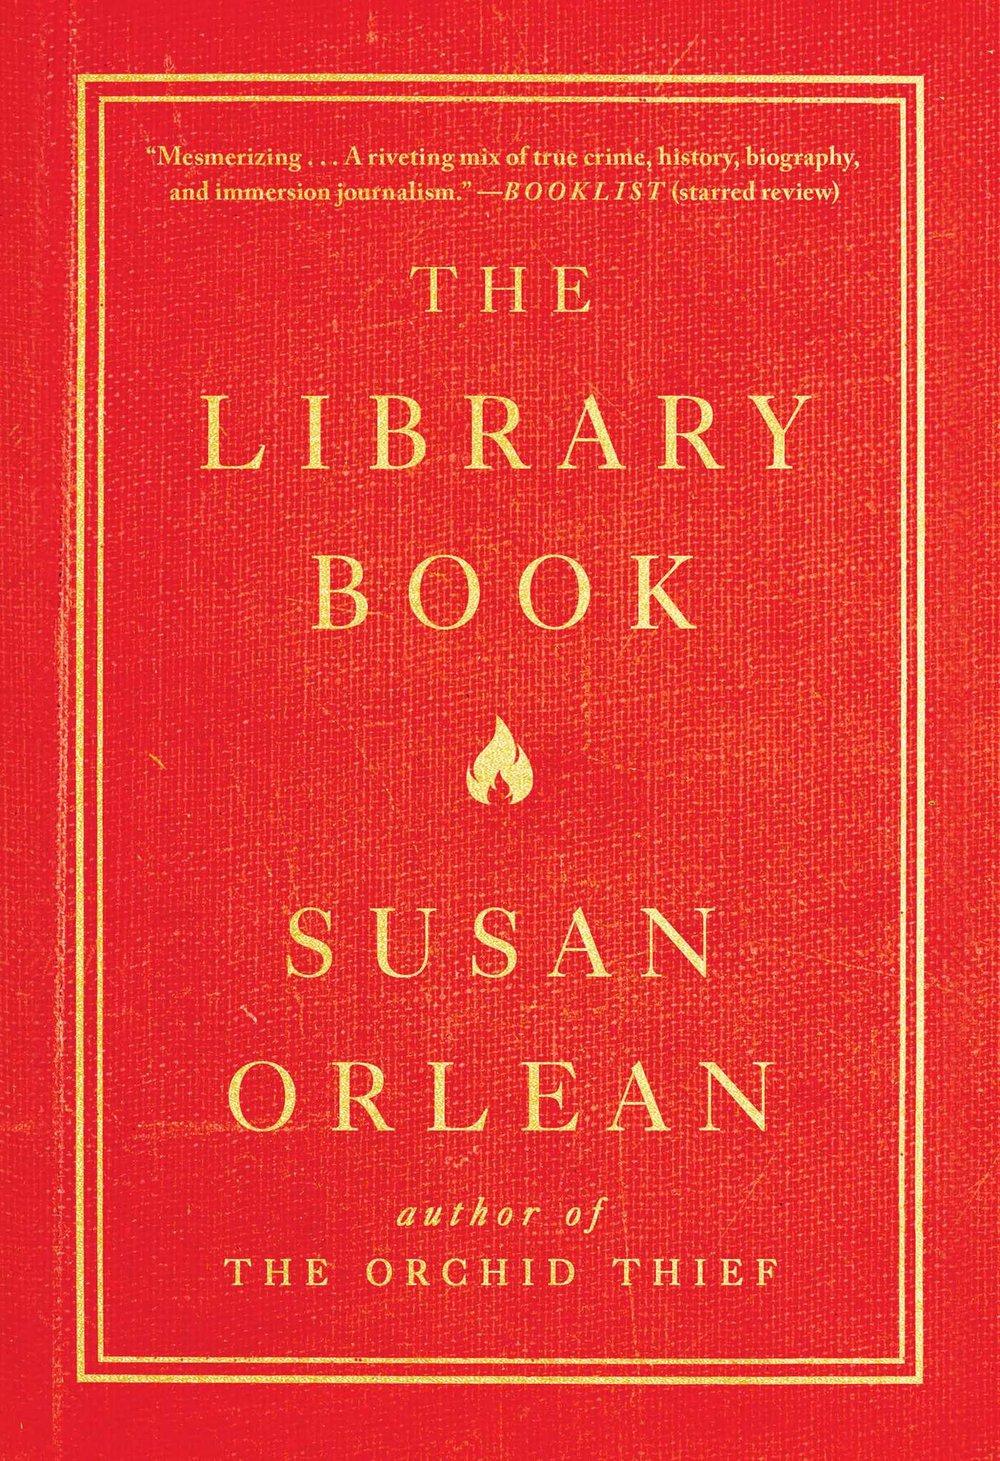 library book.jpg